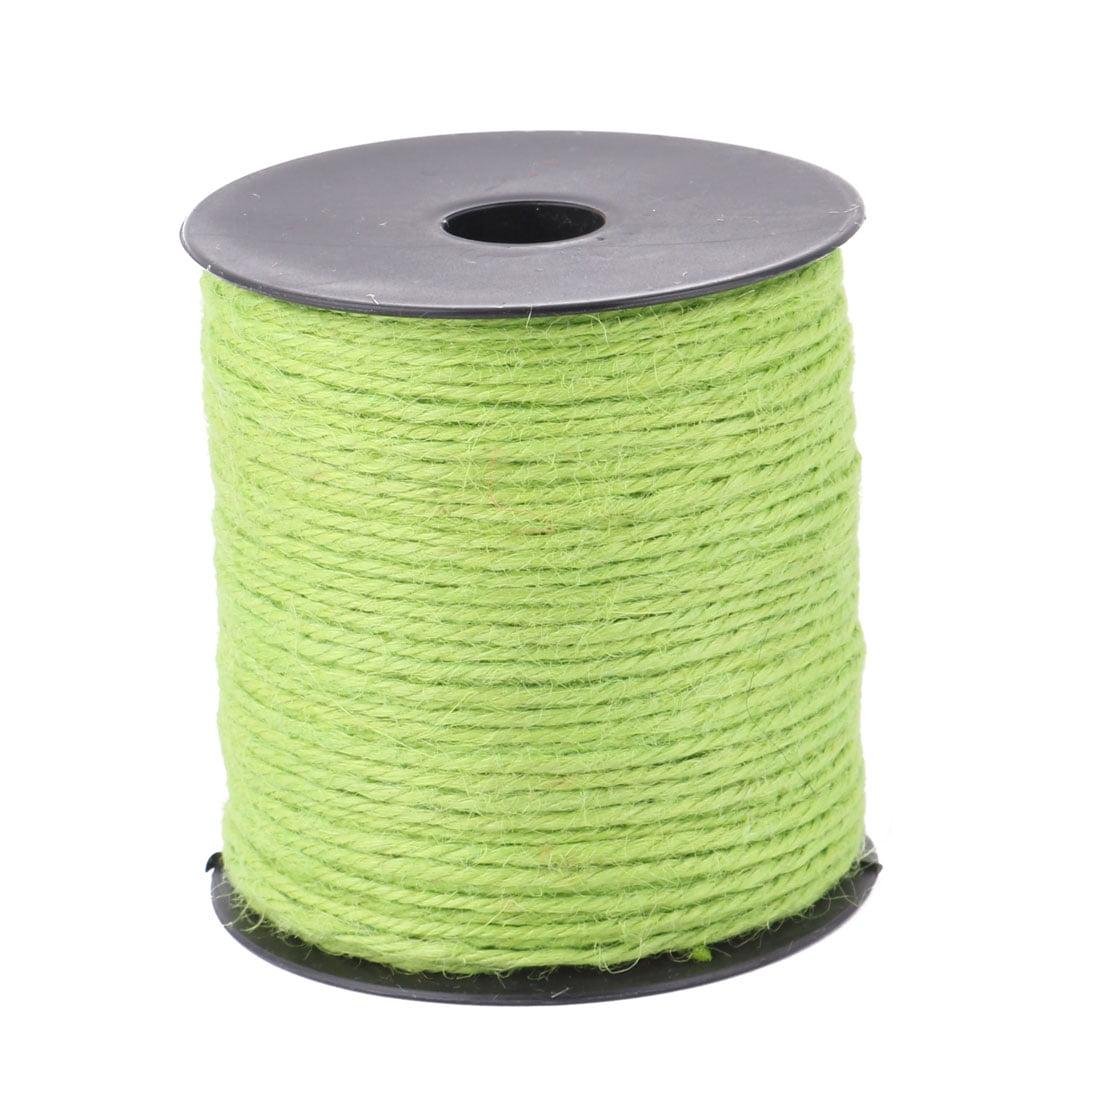 Wedding Decor Gift Wrapping Burlap String Twine Ribbon Roll Green 100M Length